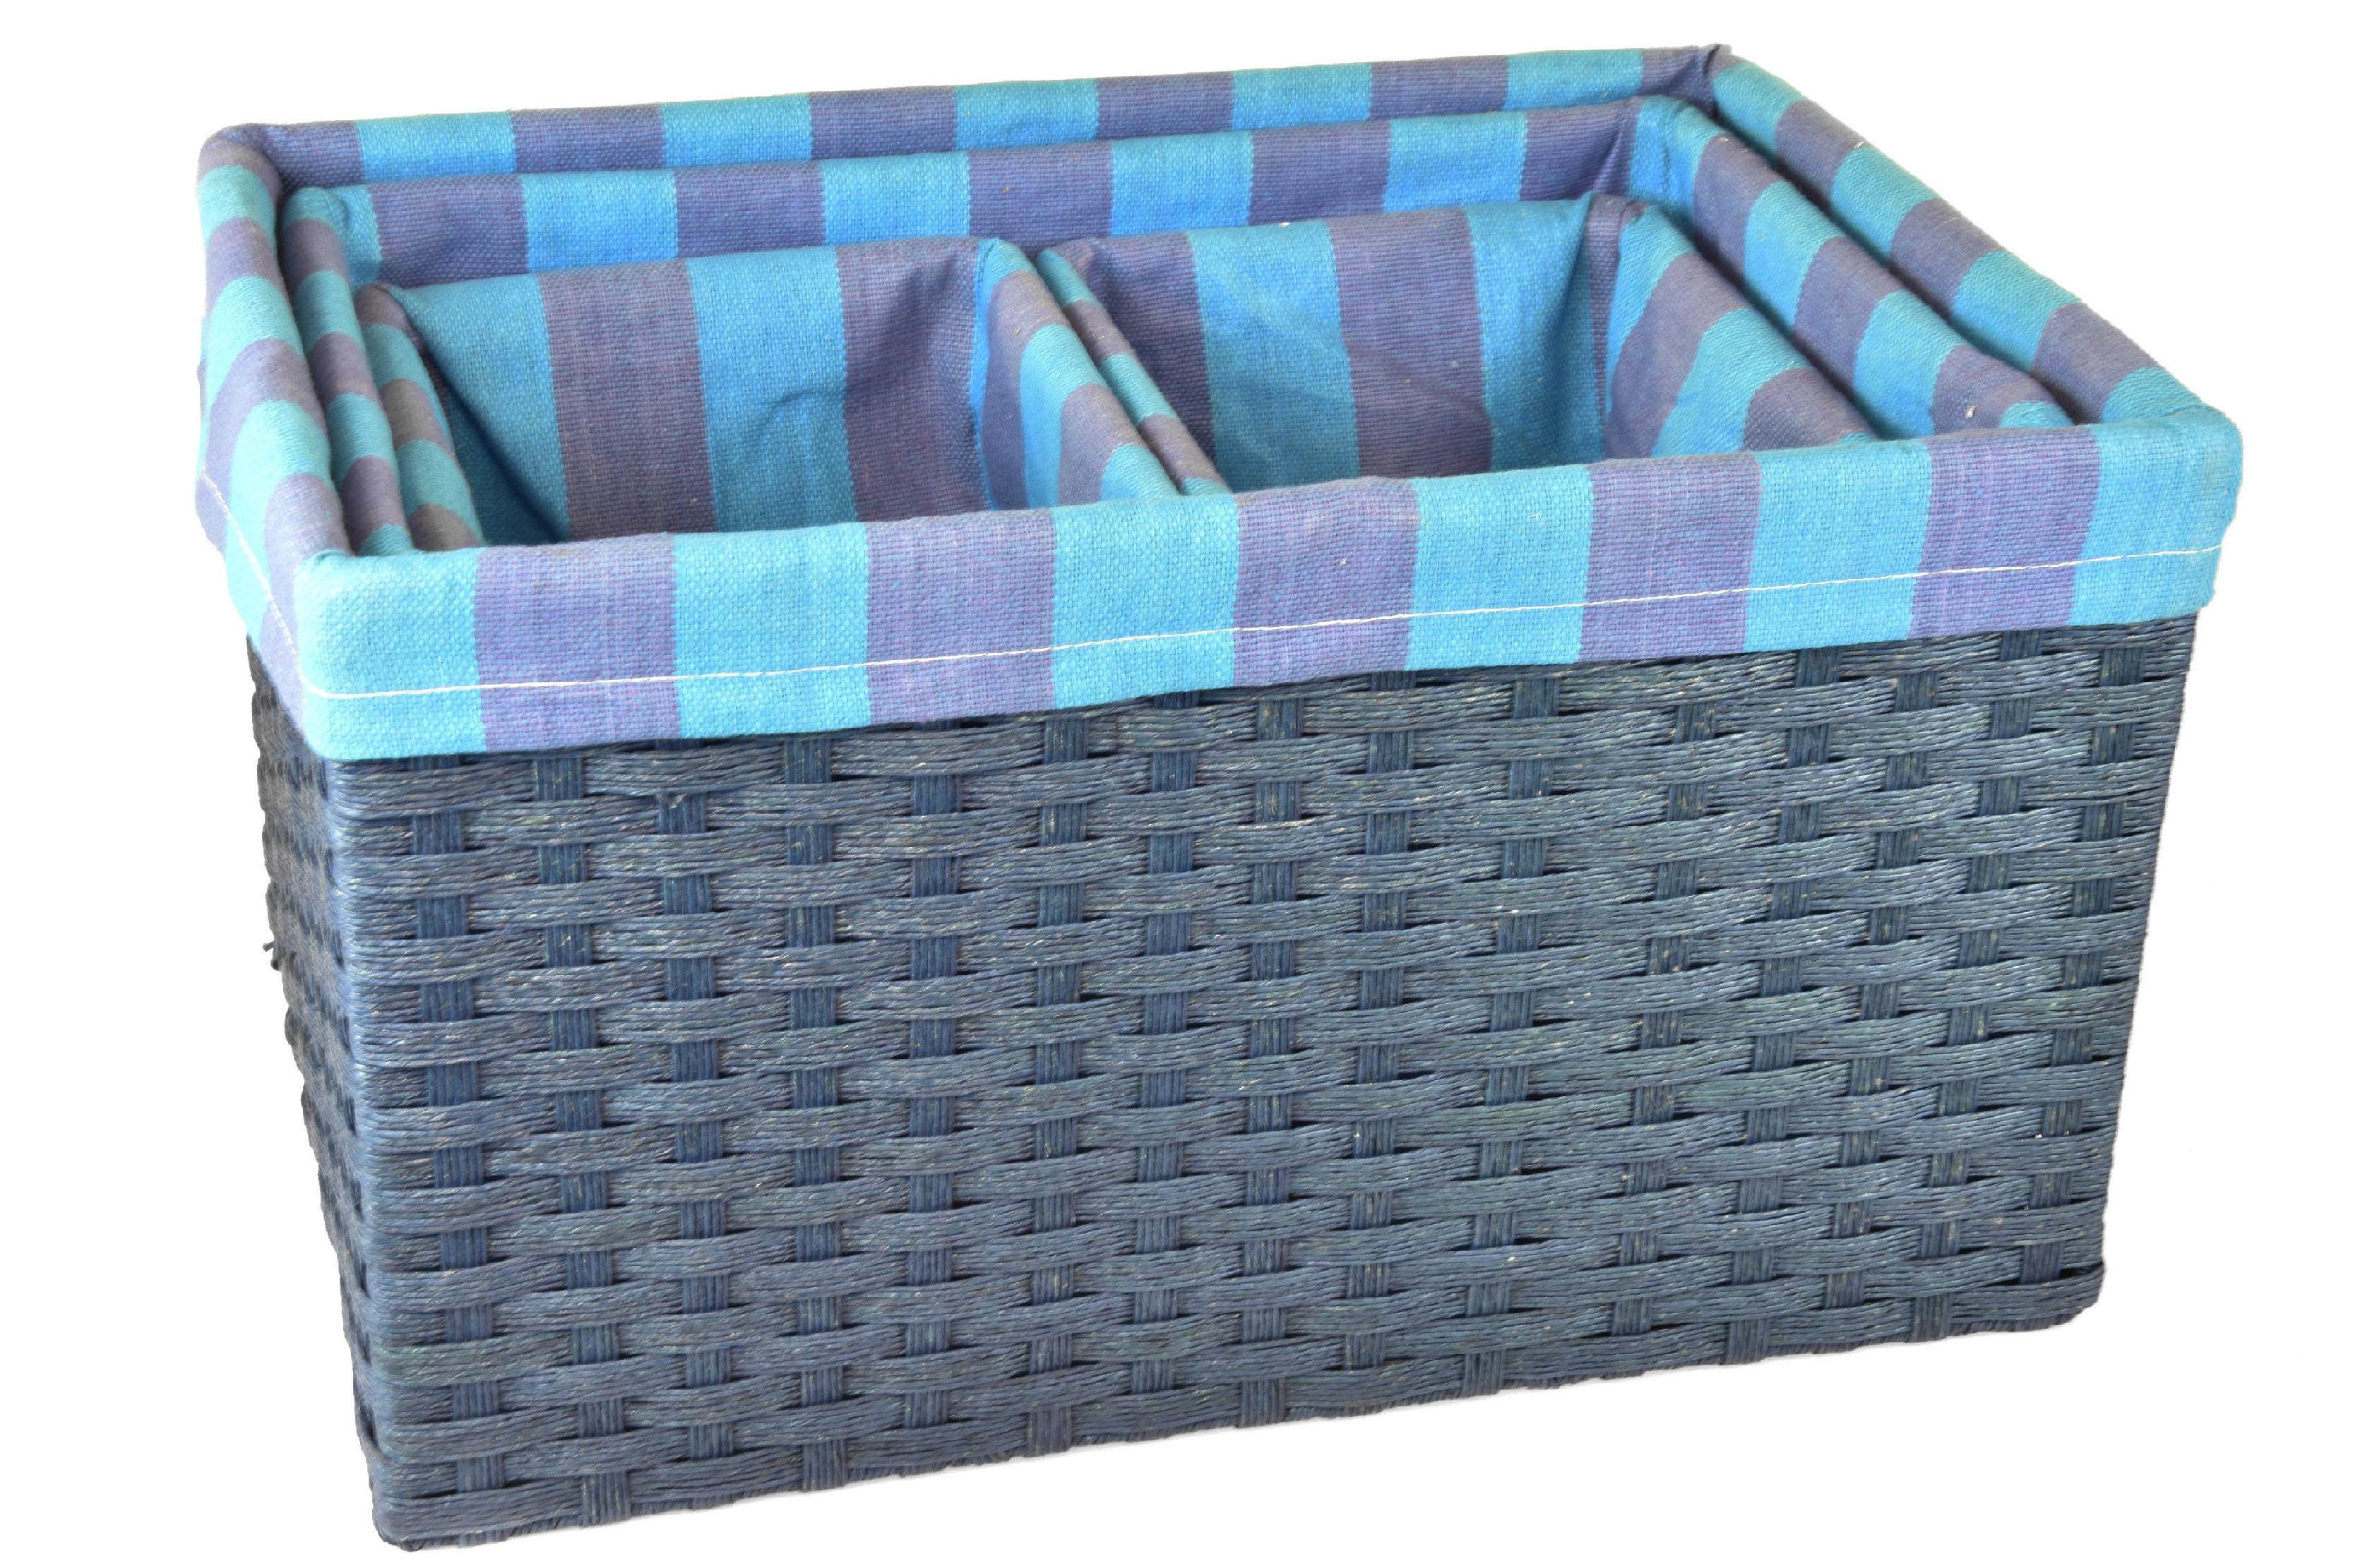 Úložný box modrý rozměry boxu (cm): Sada 30x44x25 26x40x23 18x22x20 18x22x20